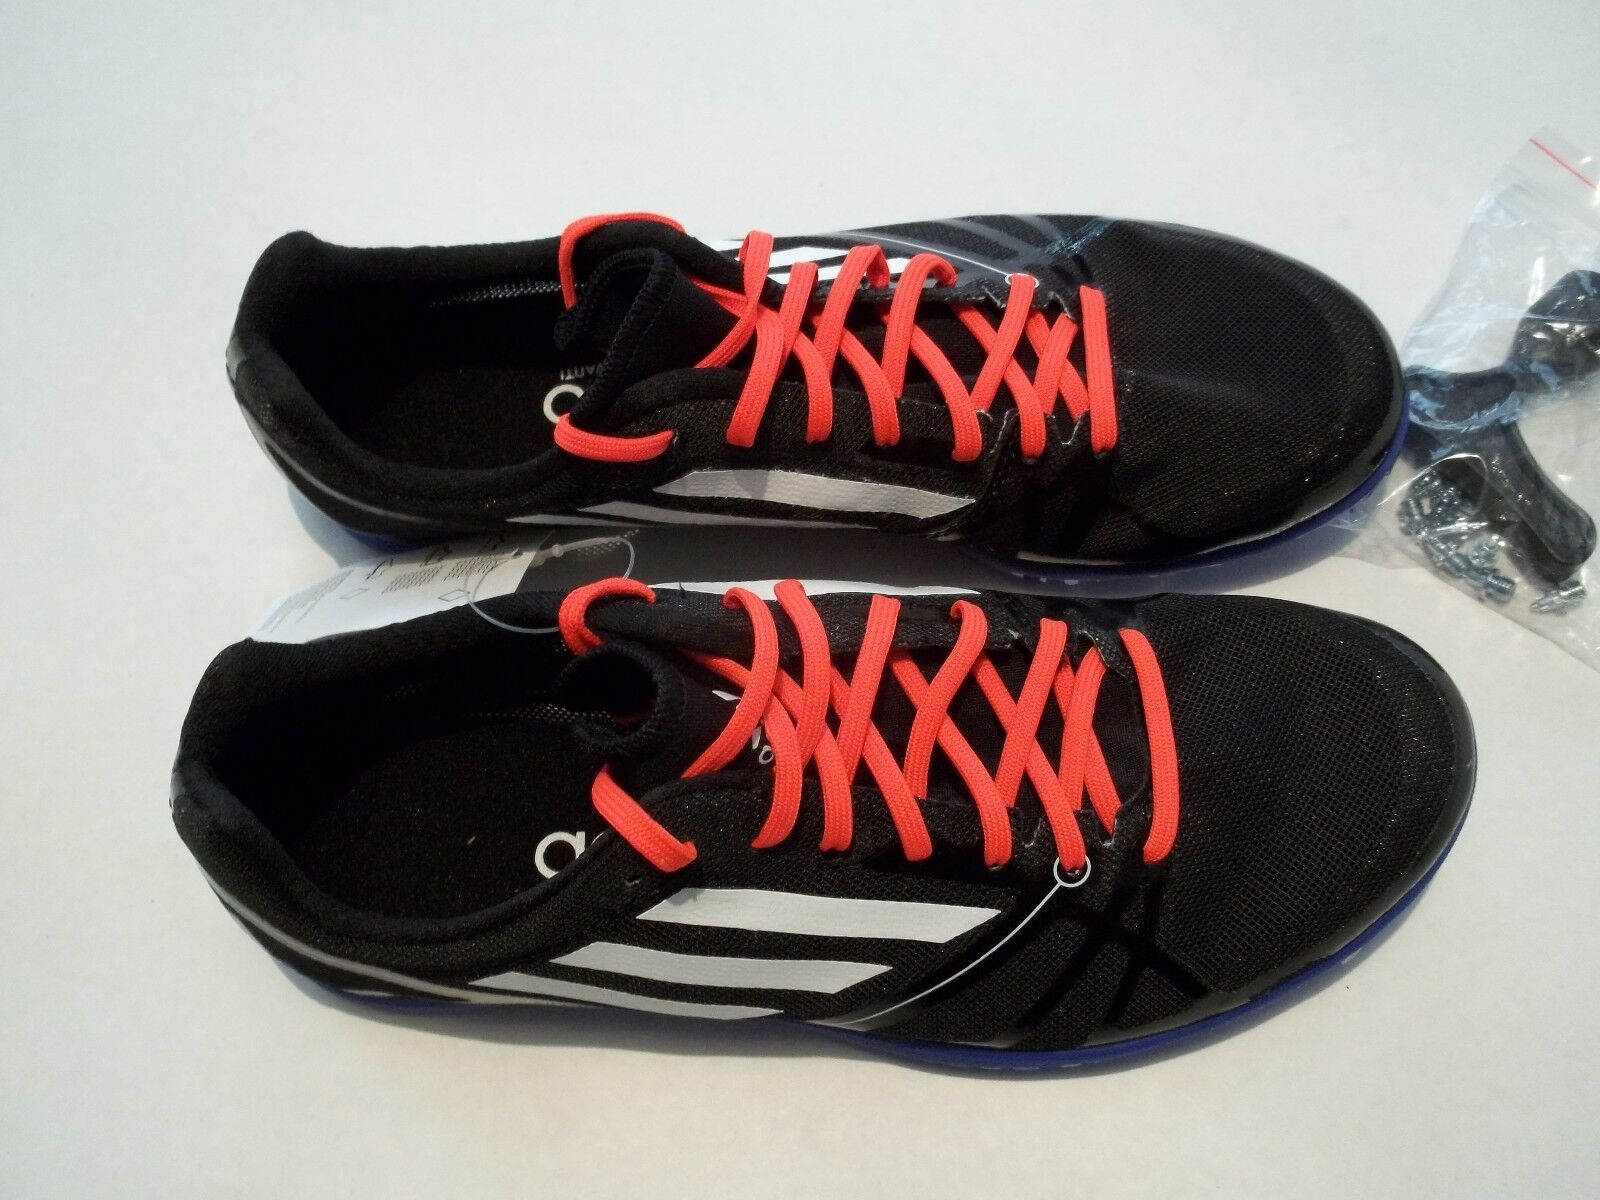 brand new c55bb b58f3 ... NWT Adidas Adizero Avanti 2 Men s Size 12 12 12 Track Shoes Spikes    Tool B23446 ...